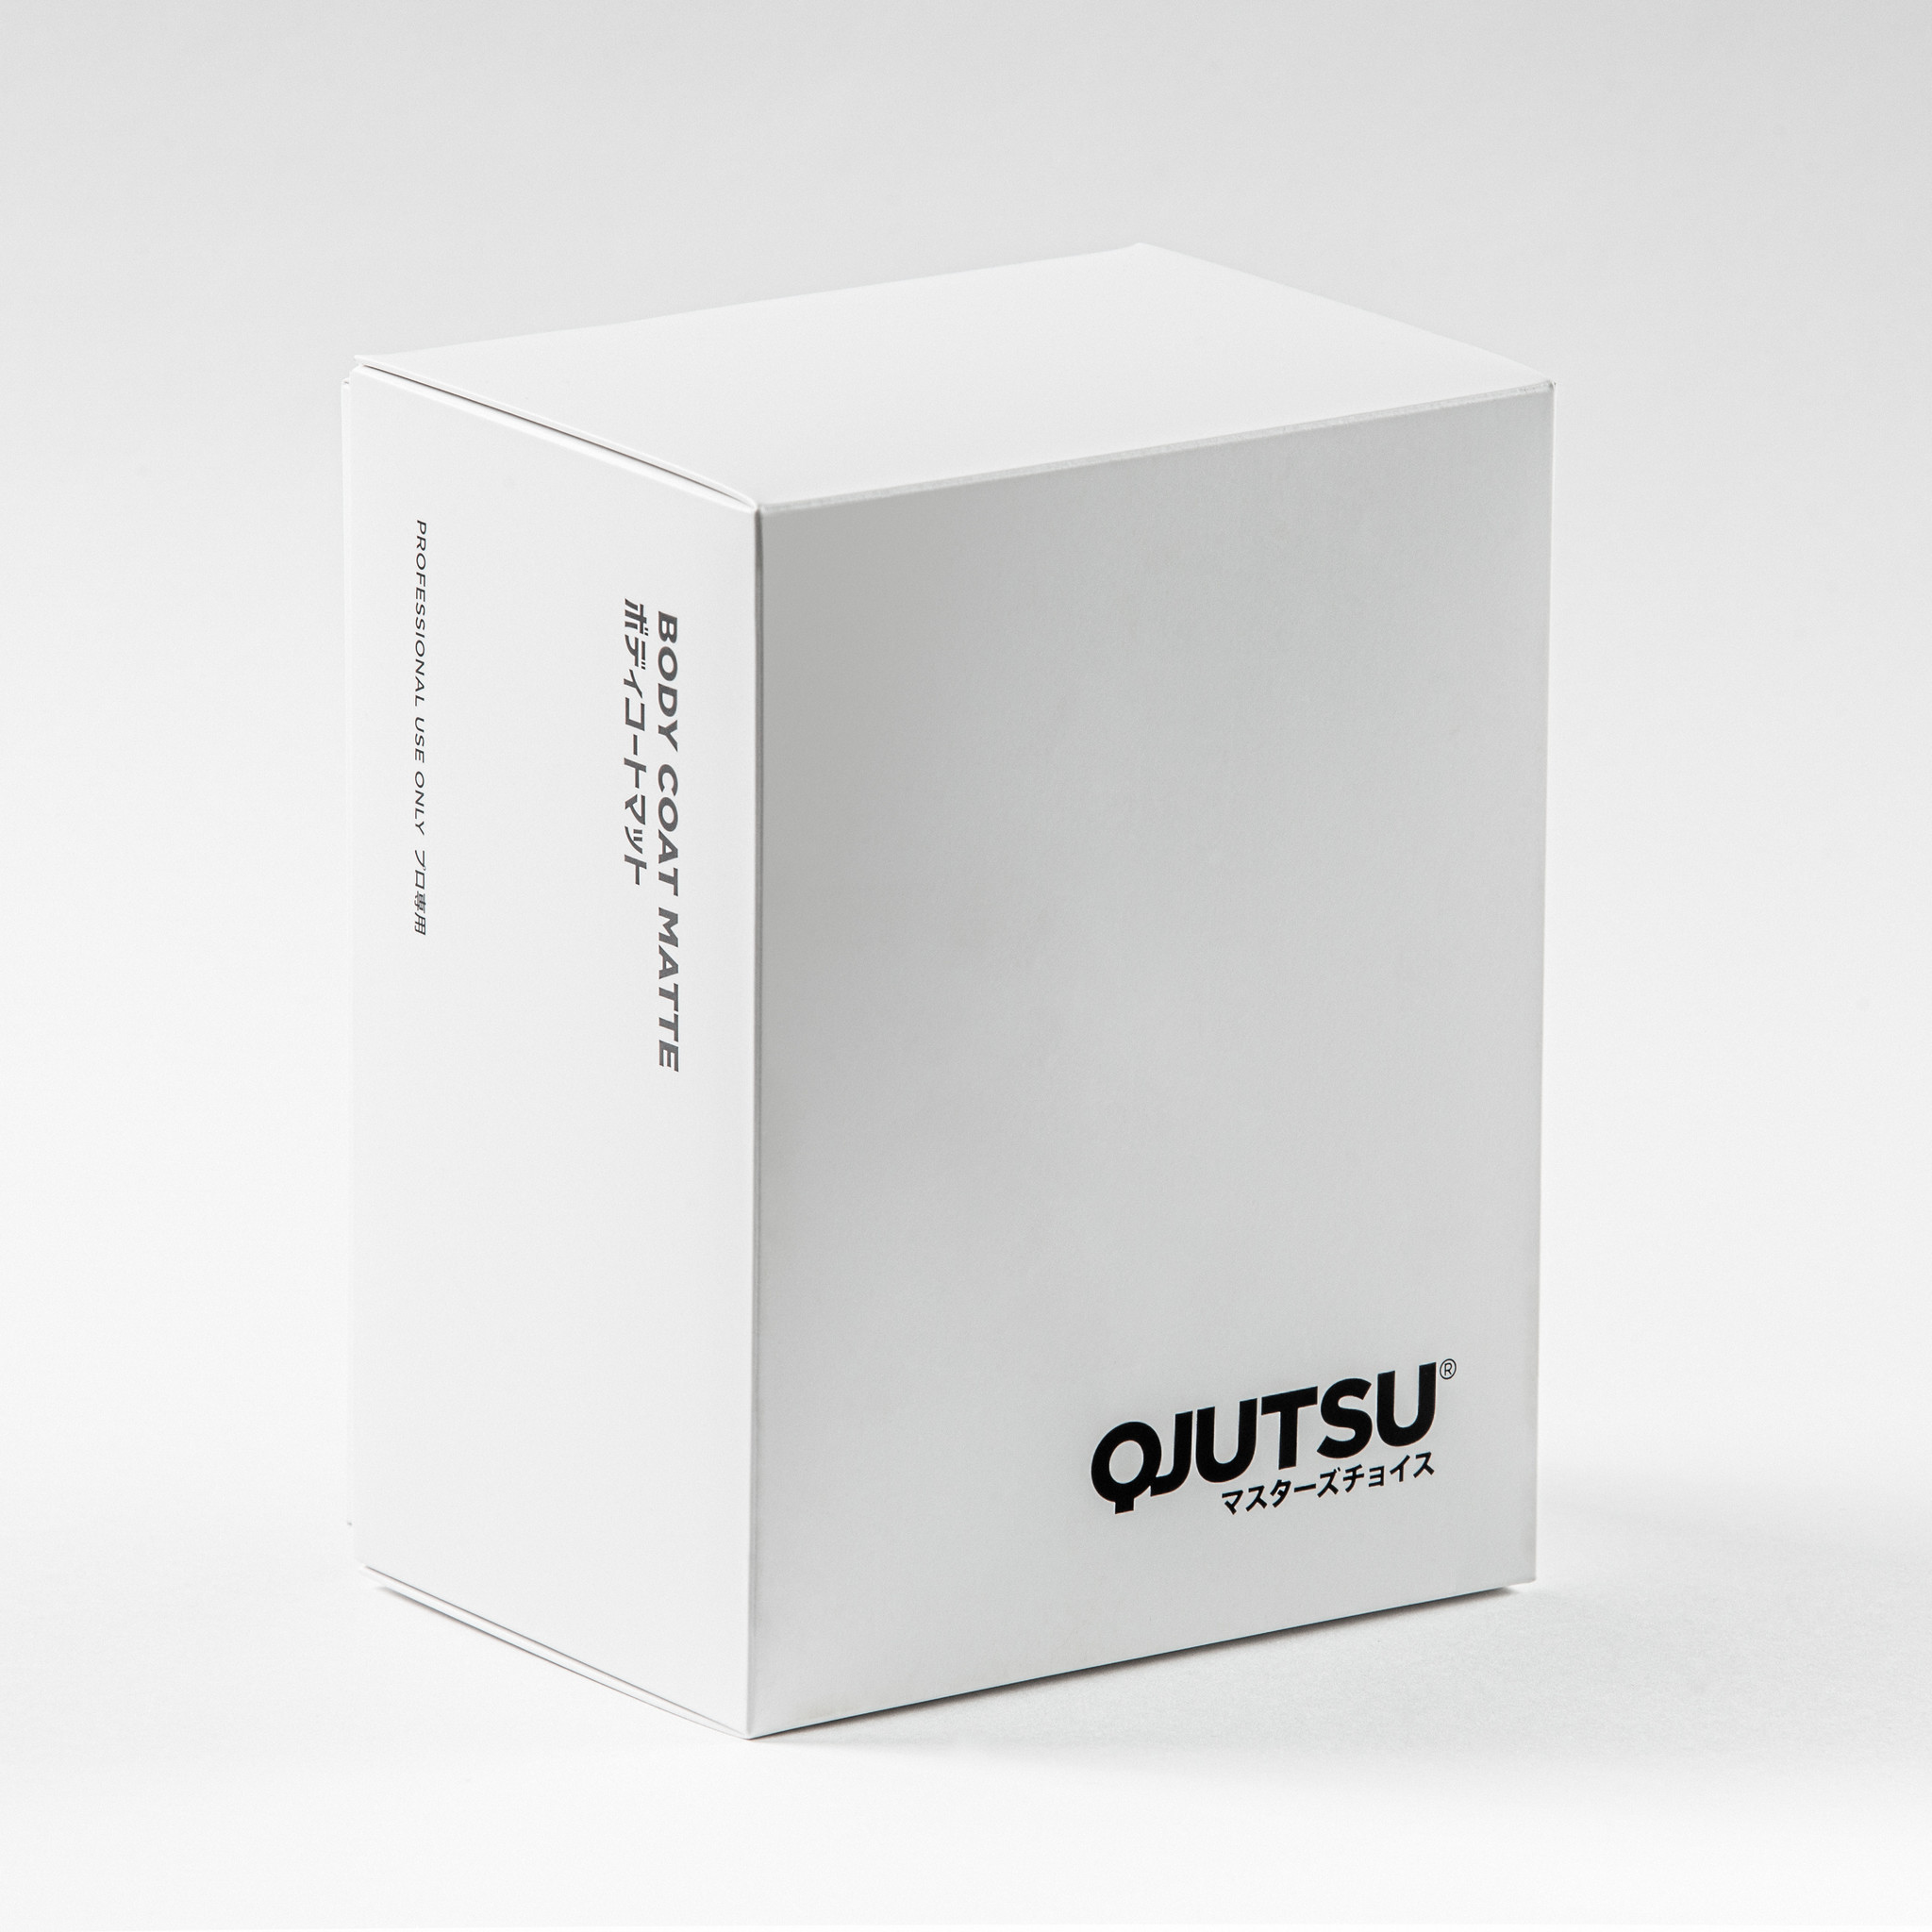 Soft99 Soft99 QJUTSU Body Coat Matt 100ml